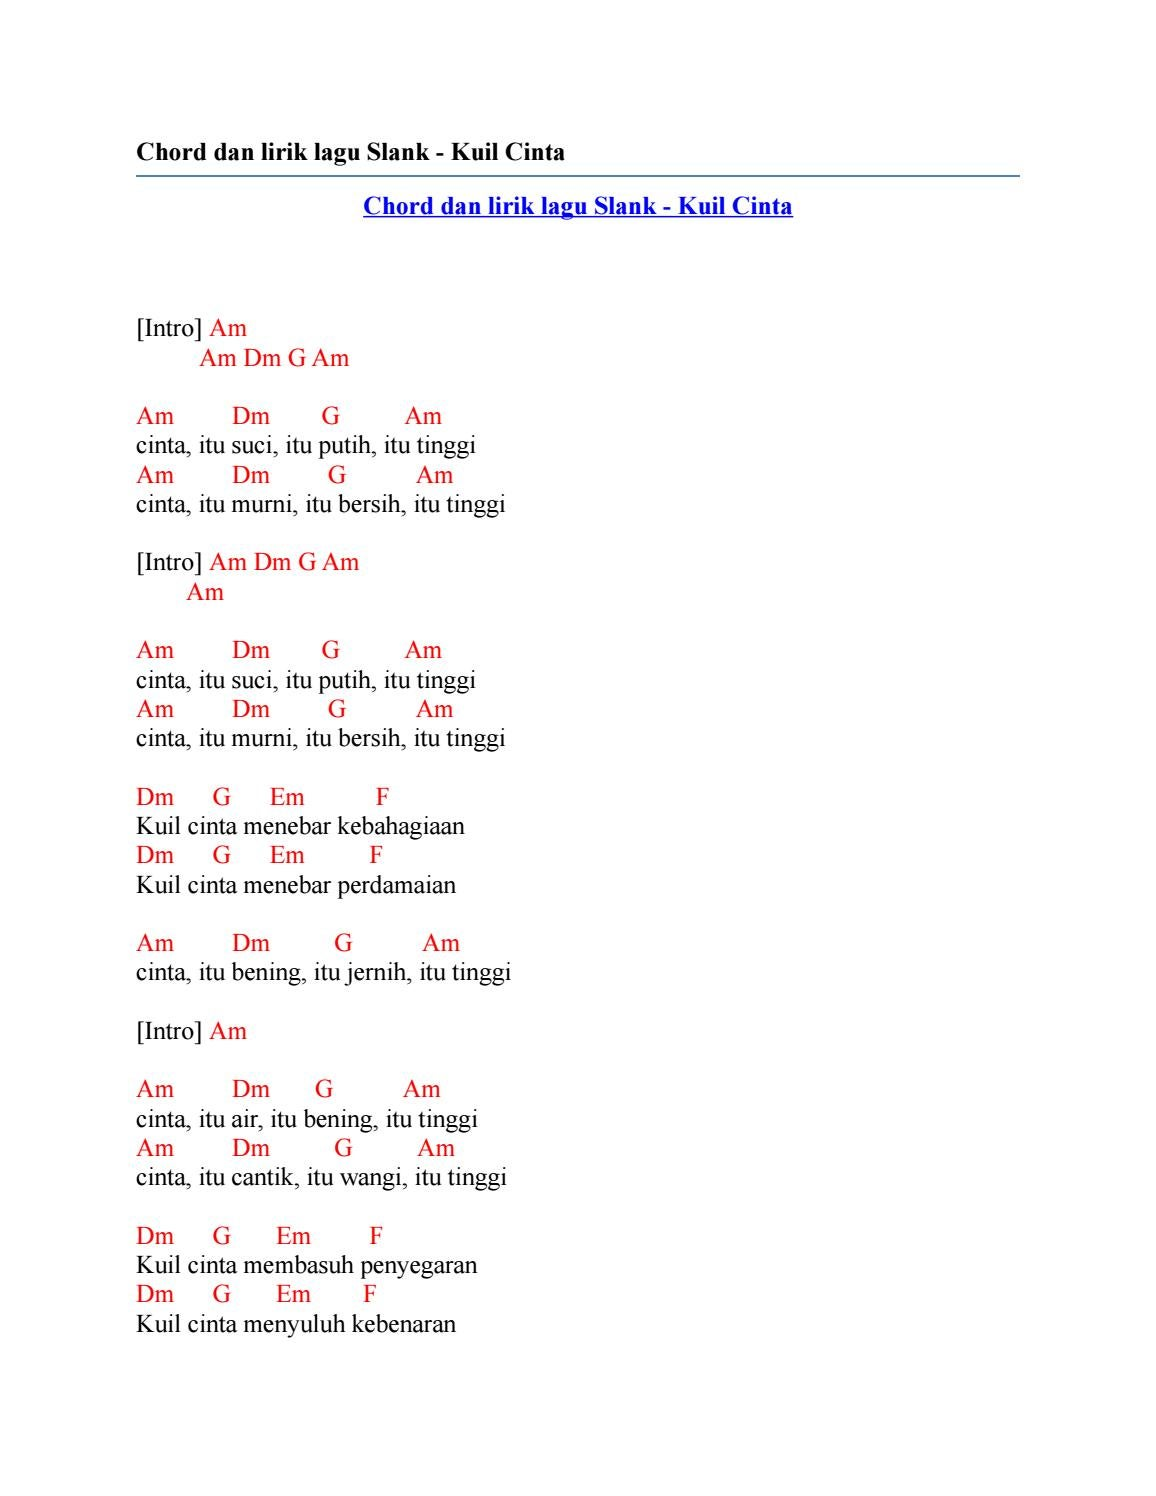 Chord Slank Terlalu Pahit : chord, slank, terlalu, pahit, Chord, Slank, Cinta